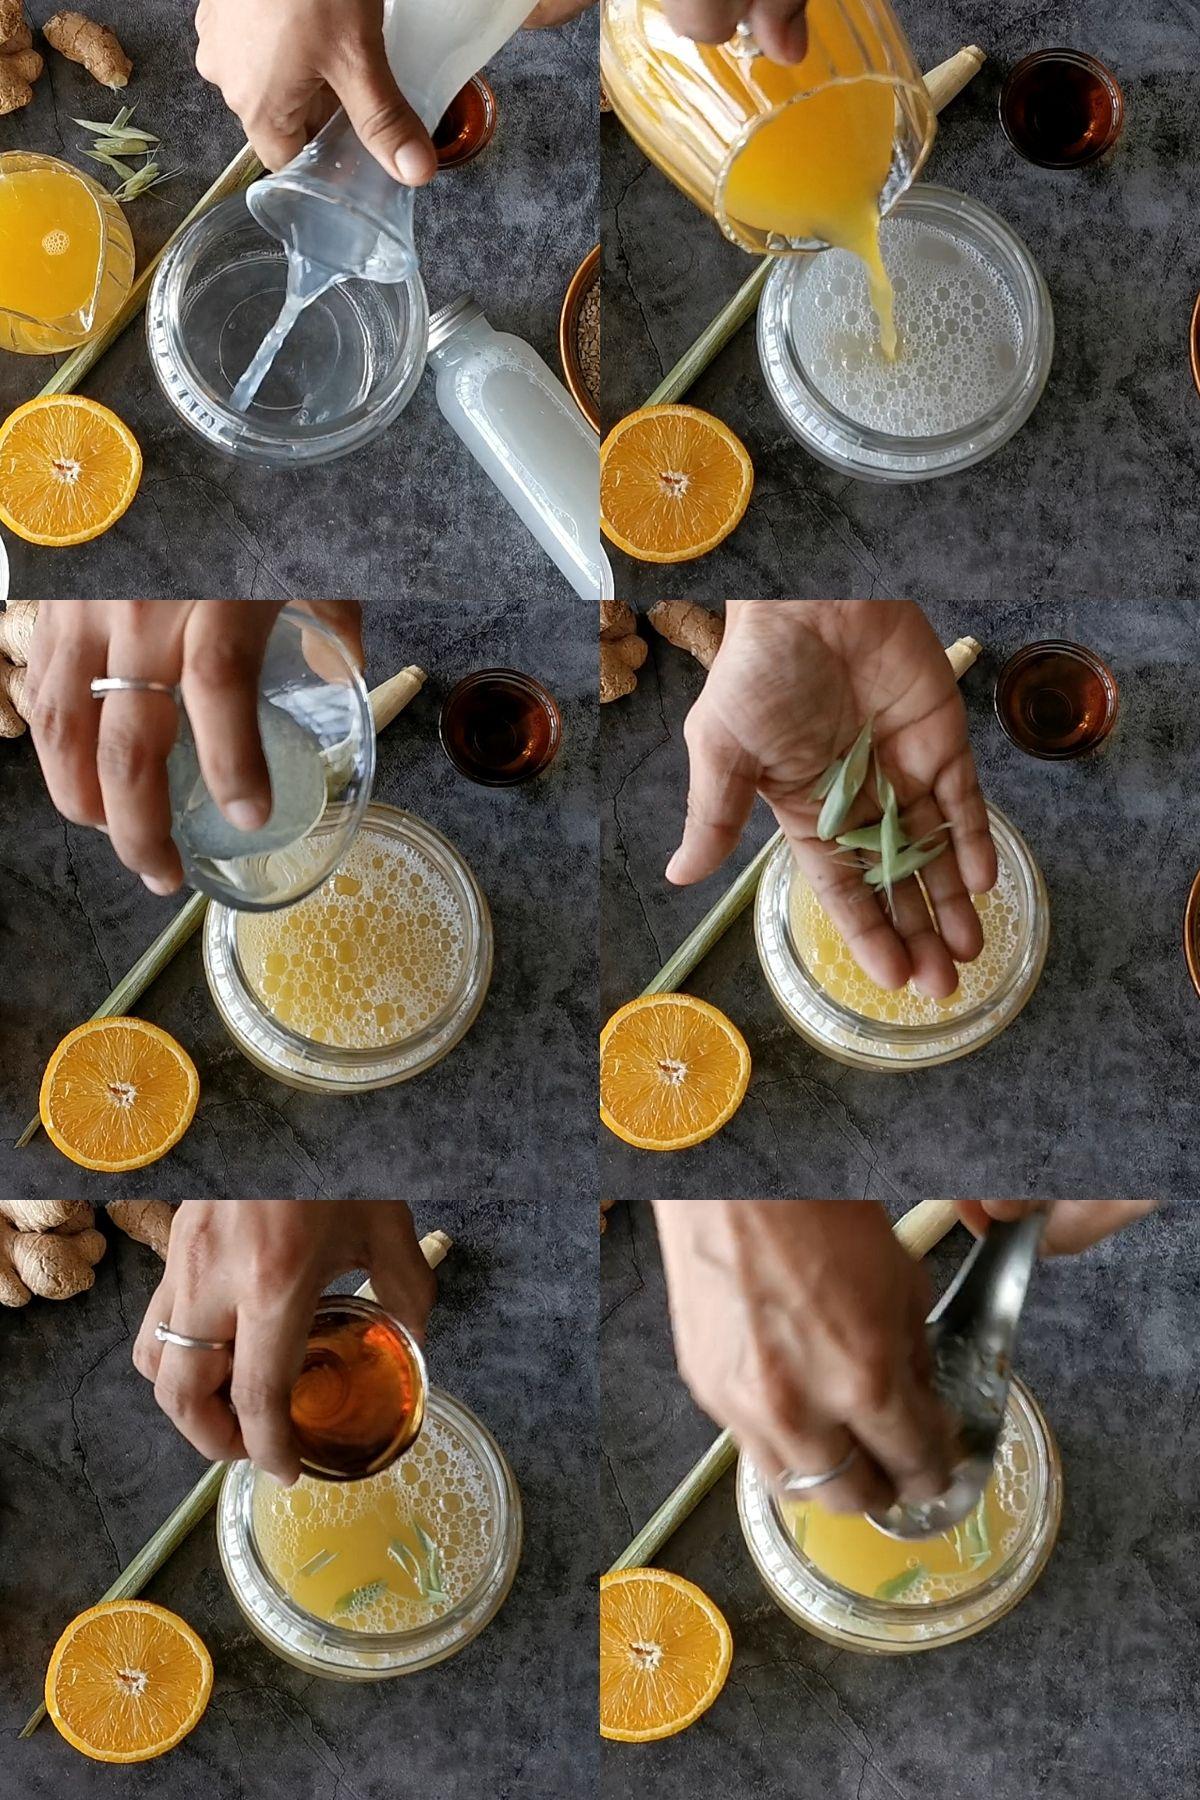 how to make barley lemonade step by step